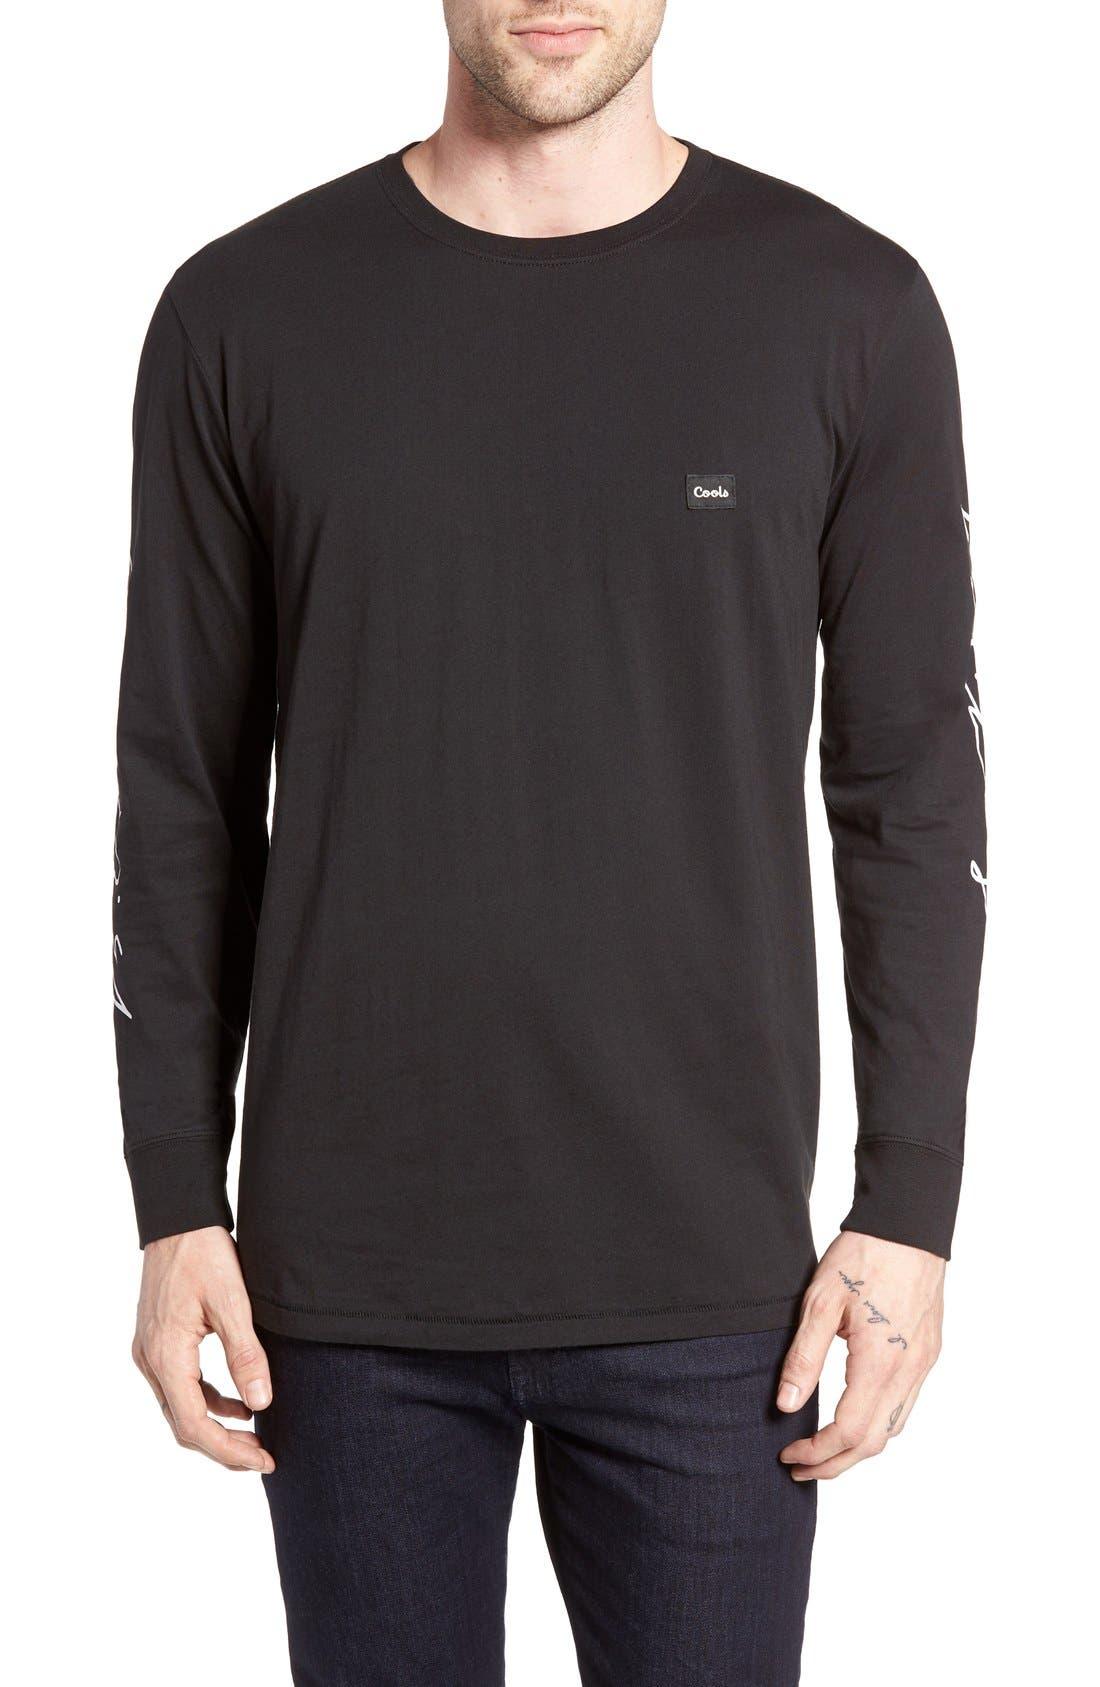 Barney Cools B. Cools B. Cause Graphic Crewneck T-Shirt